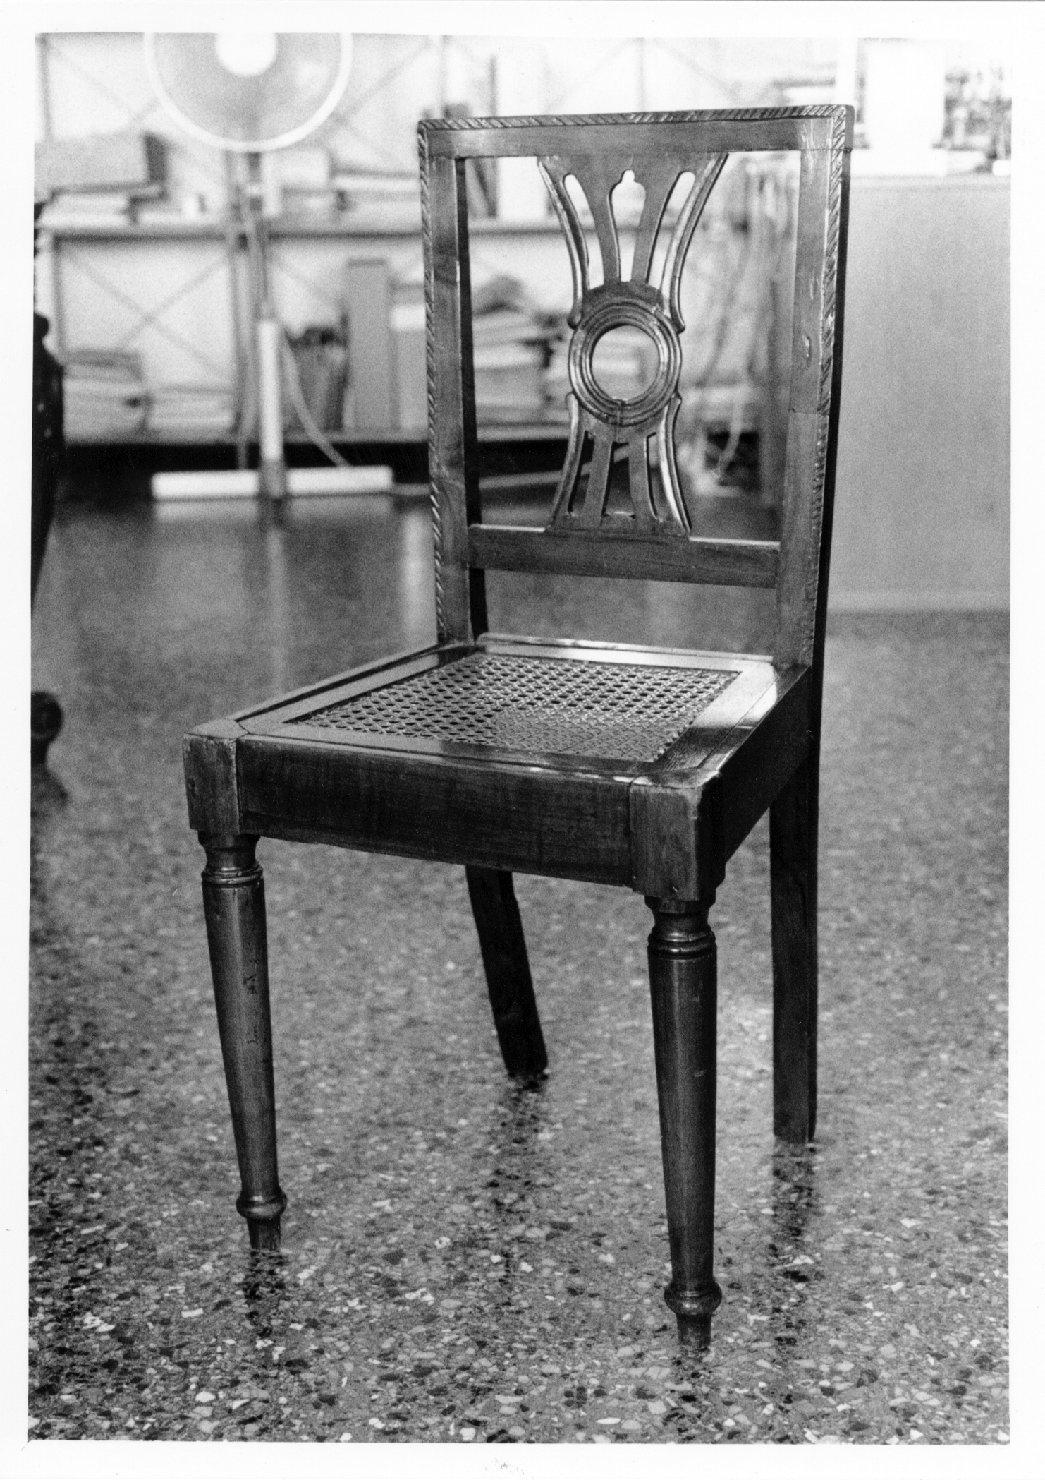 sedia, opera isolata - manifattura veneta (sec. XIX)